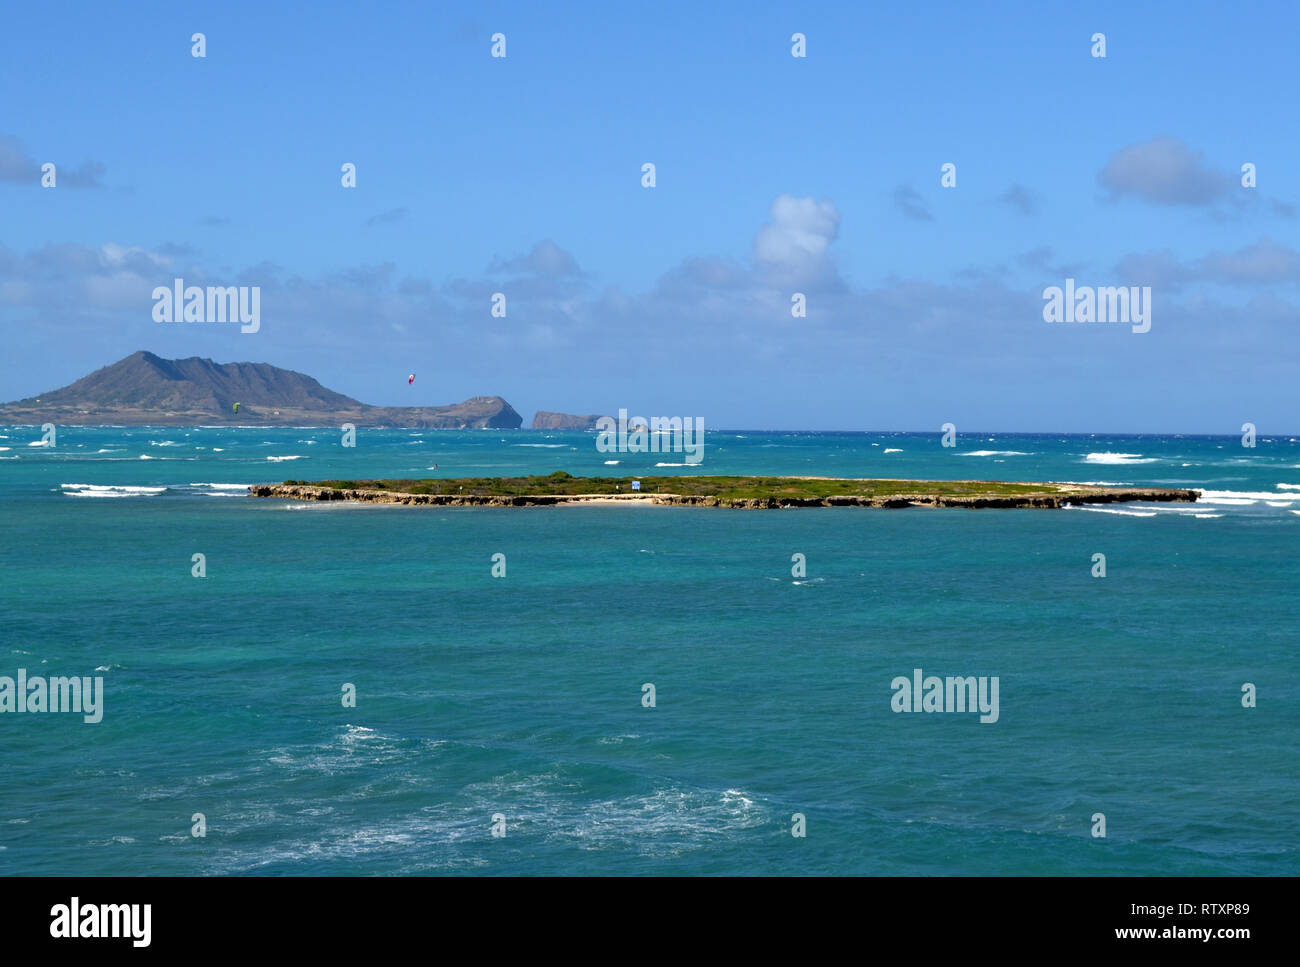 Flat Island off Kailua Beach, Oahu, Hawaii, USA Stock Photo